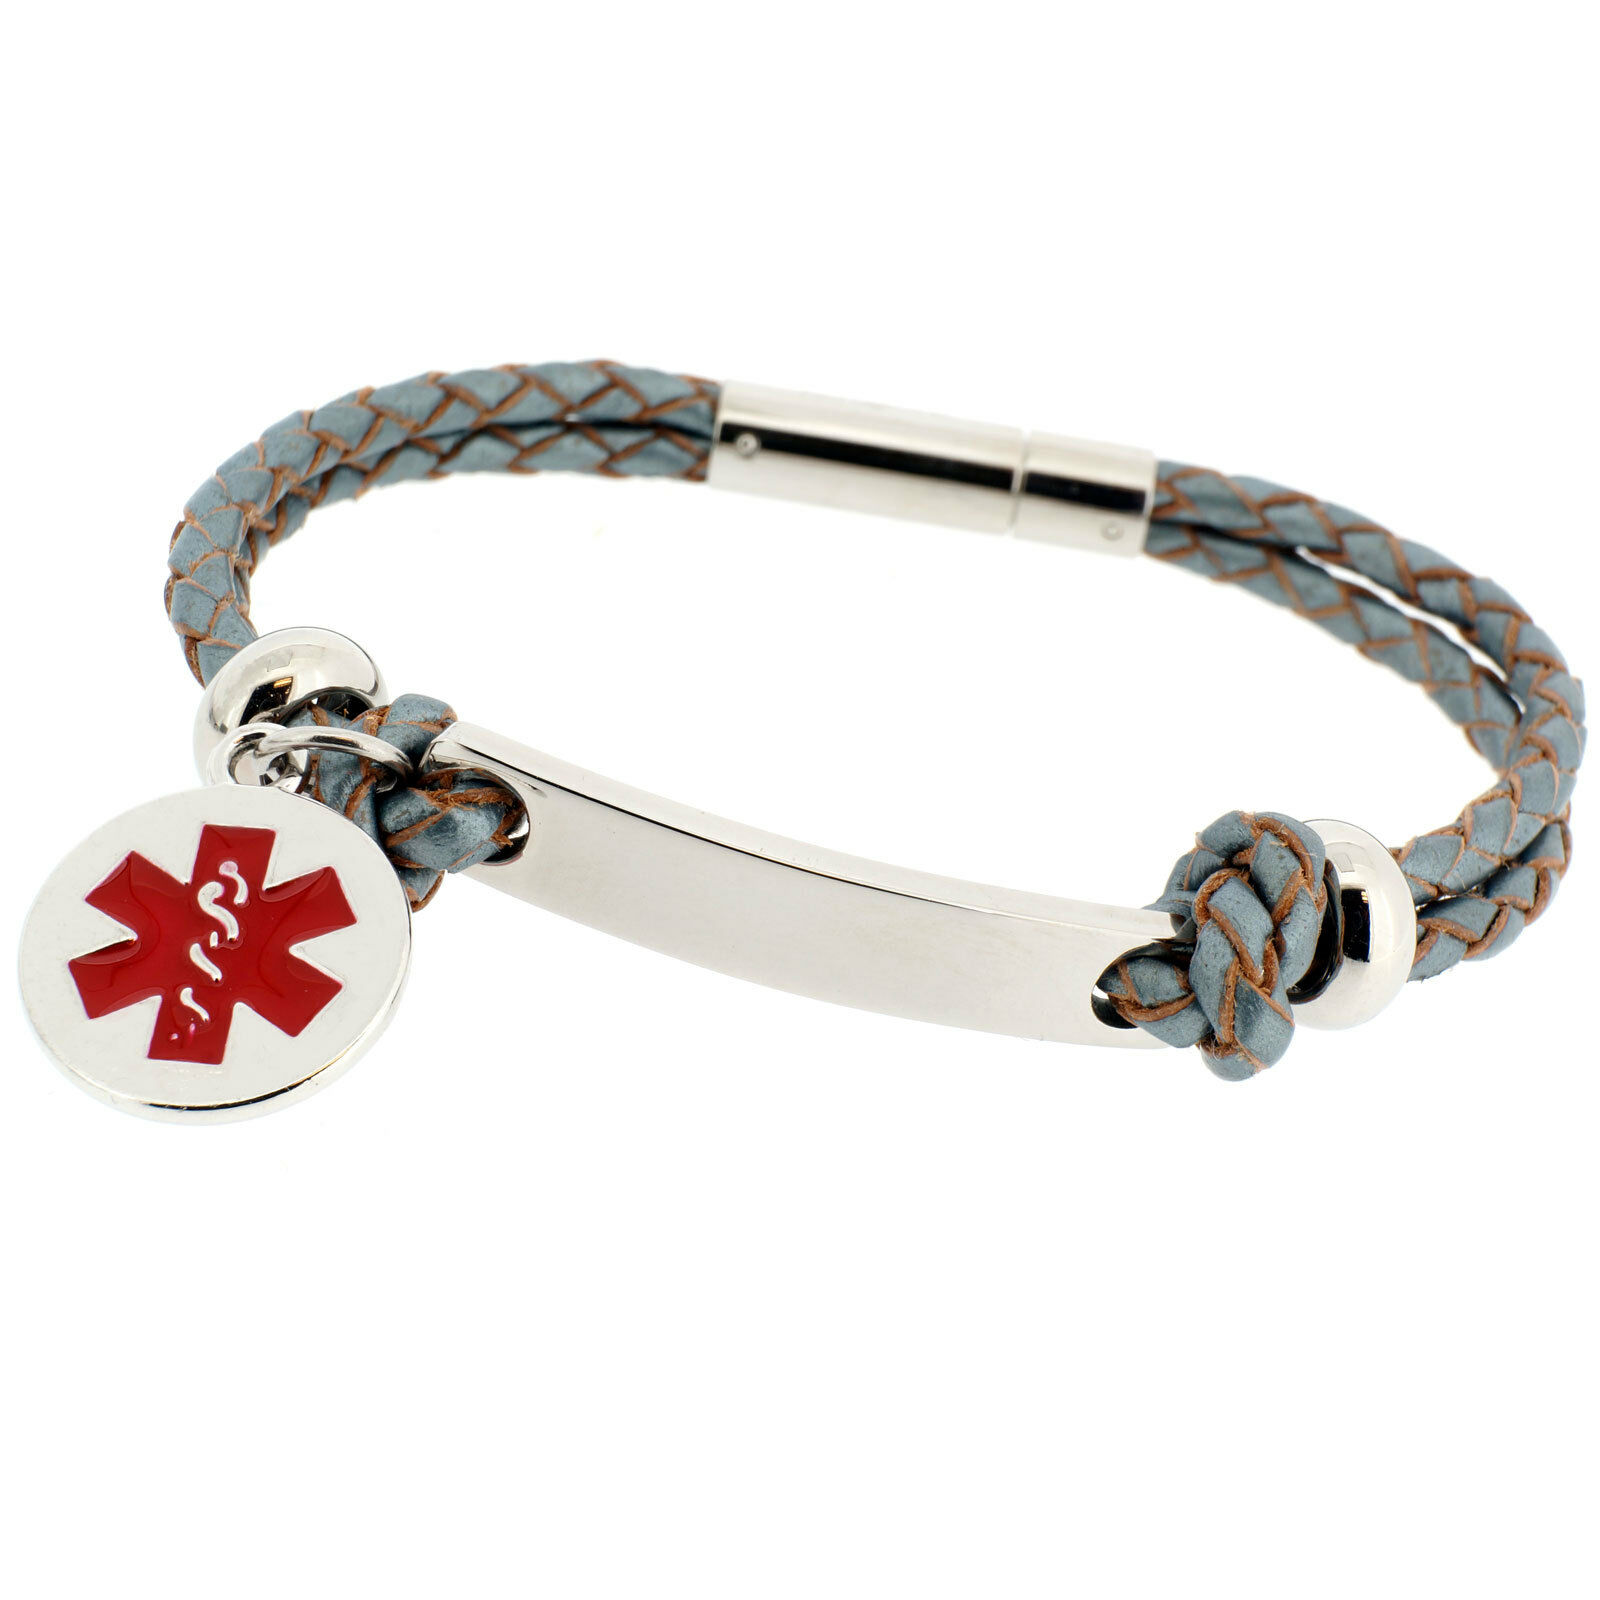 Women's Fashion LIFE SAVING ENGRAVED MEDICAL SOS ID ALERT Leather Bracelet